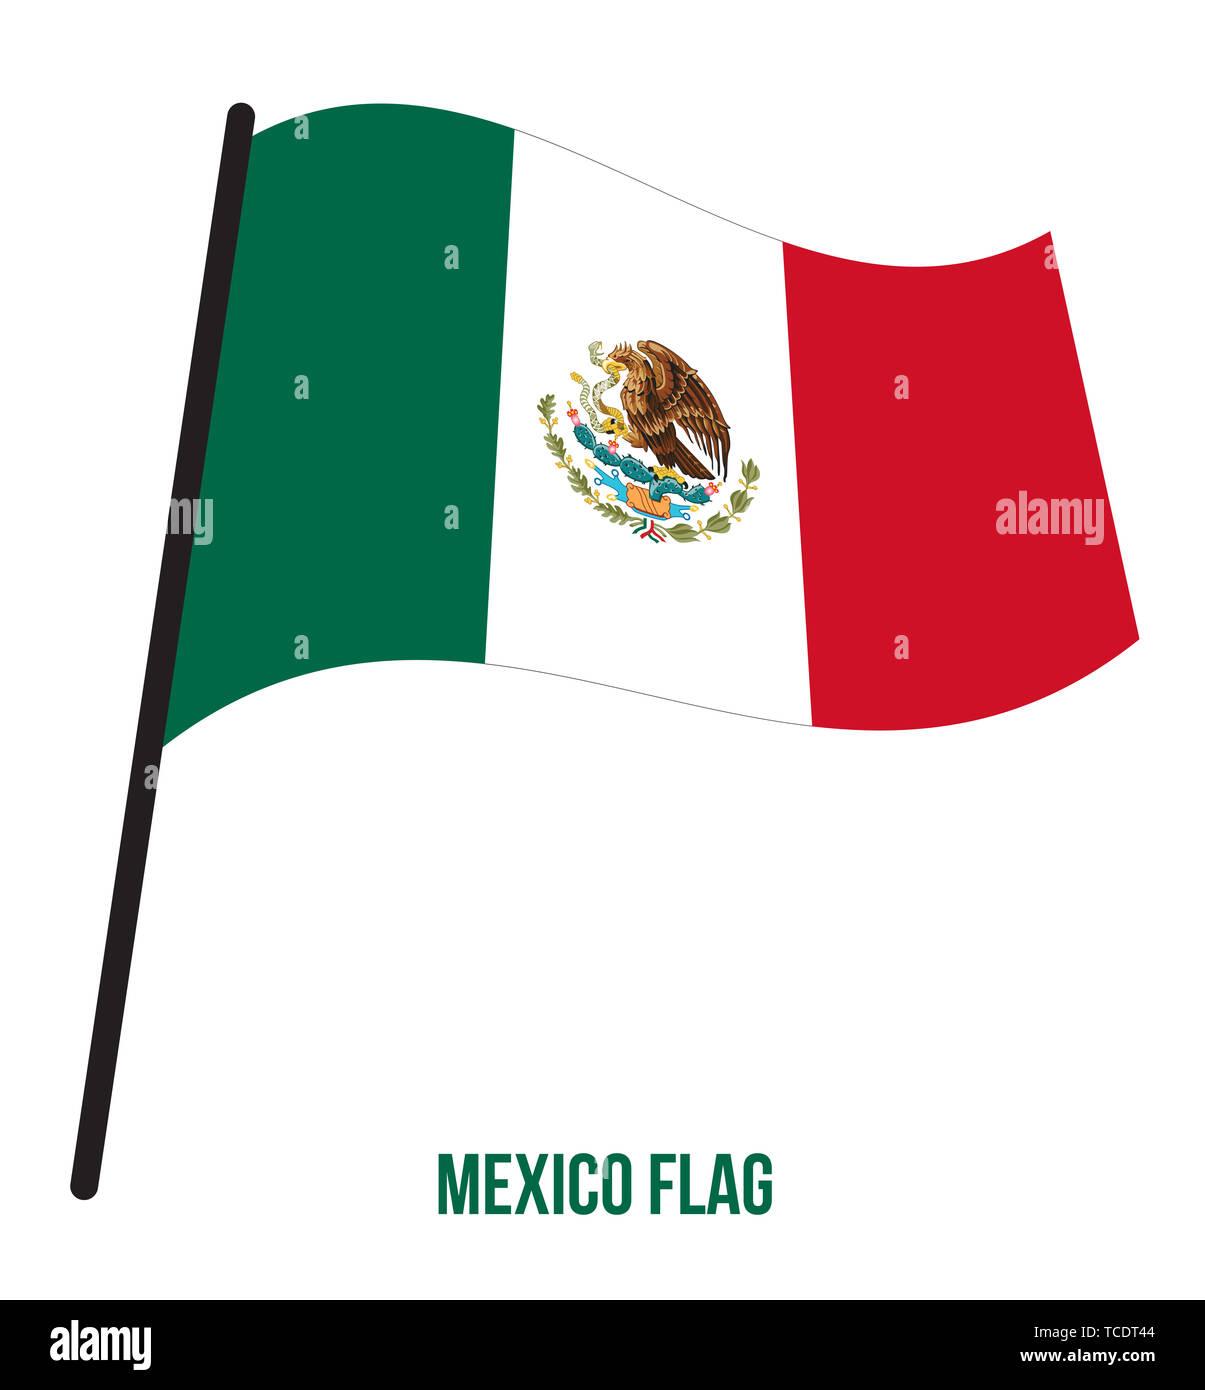 Mexico Flag Waving Vector Illustration on White Background. Mexico National Flag. - Stock Image